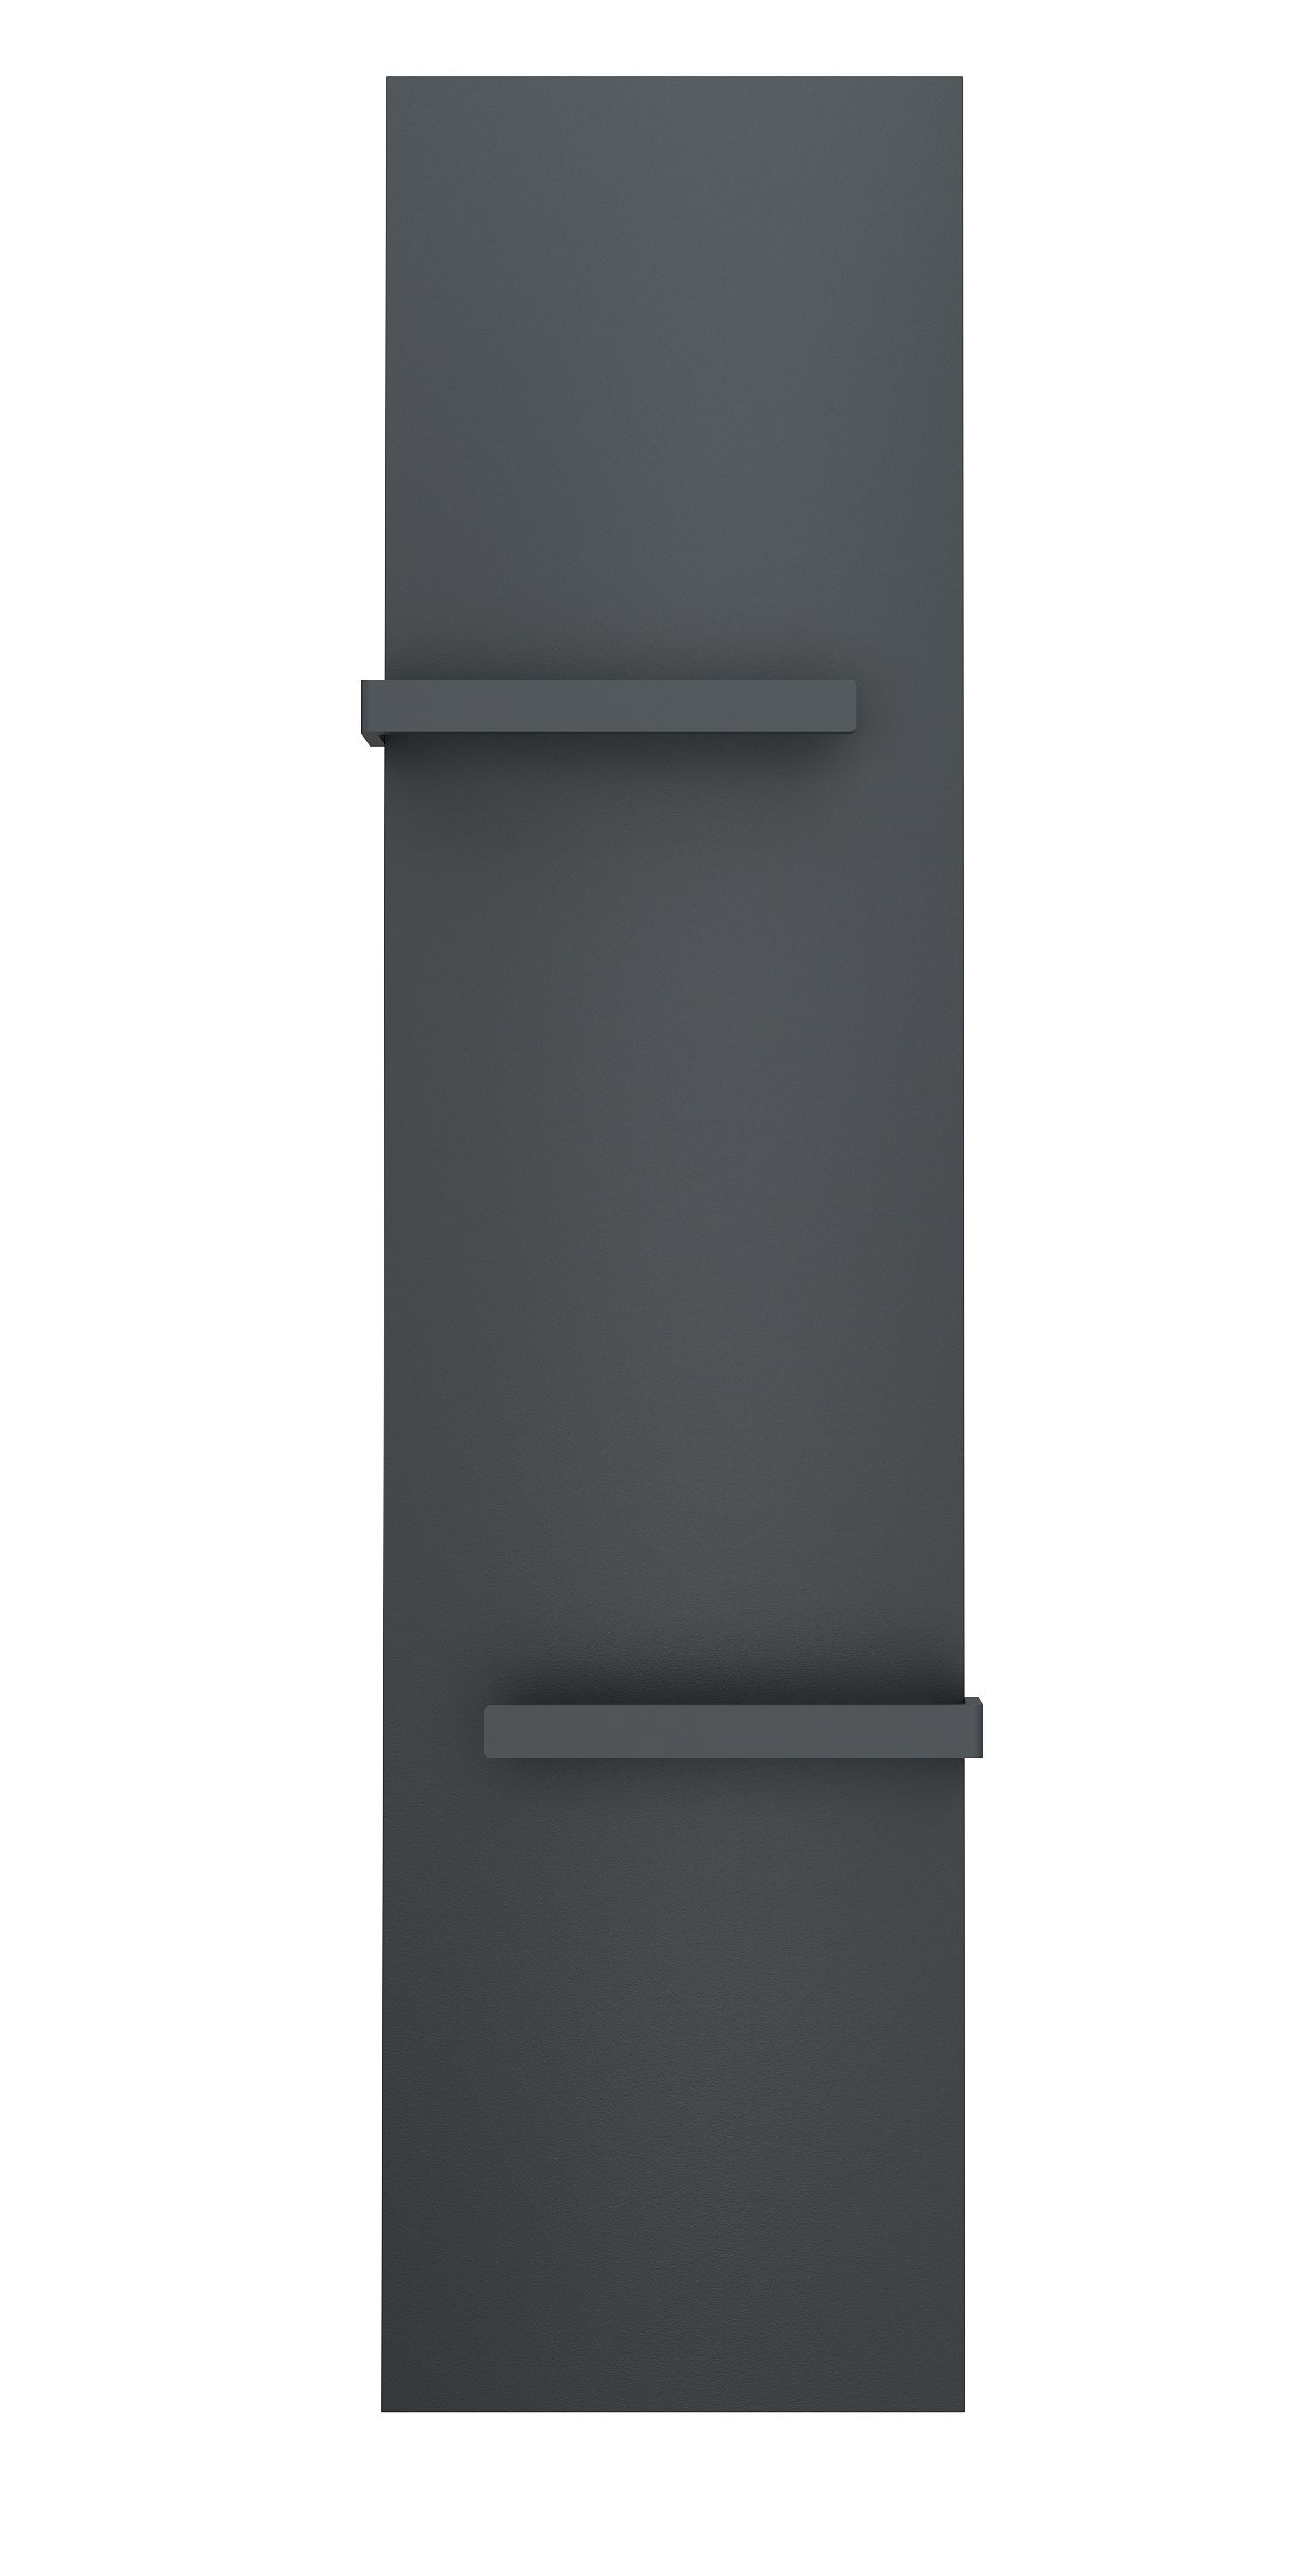 Badheizkörper ALWAR in 180 x 45 cm (Mittelanschluss, grau)